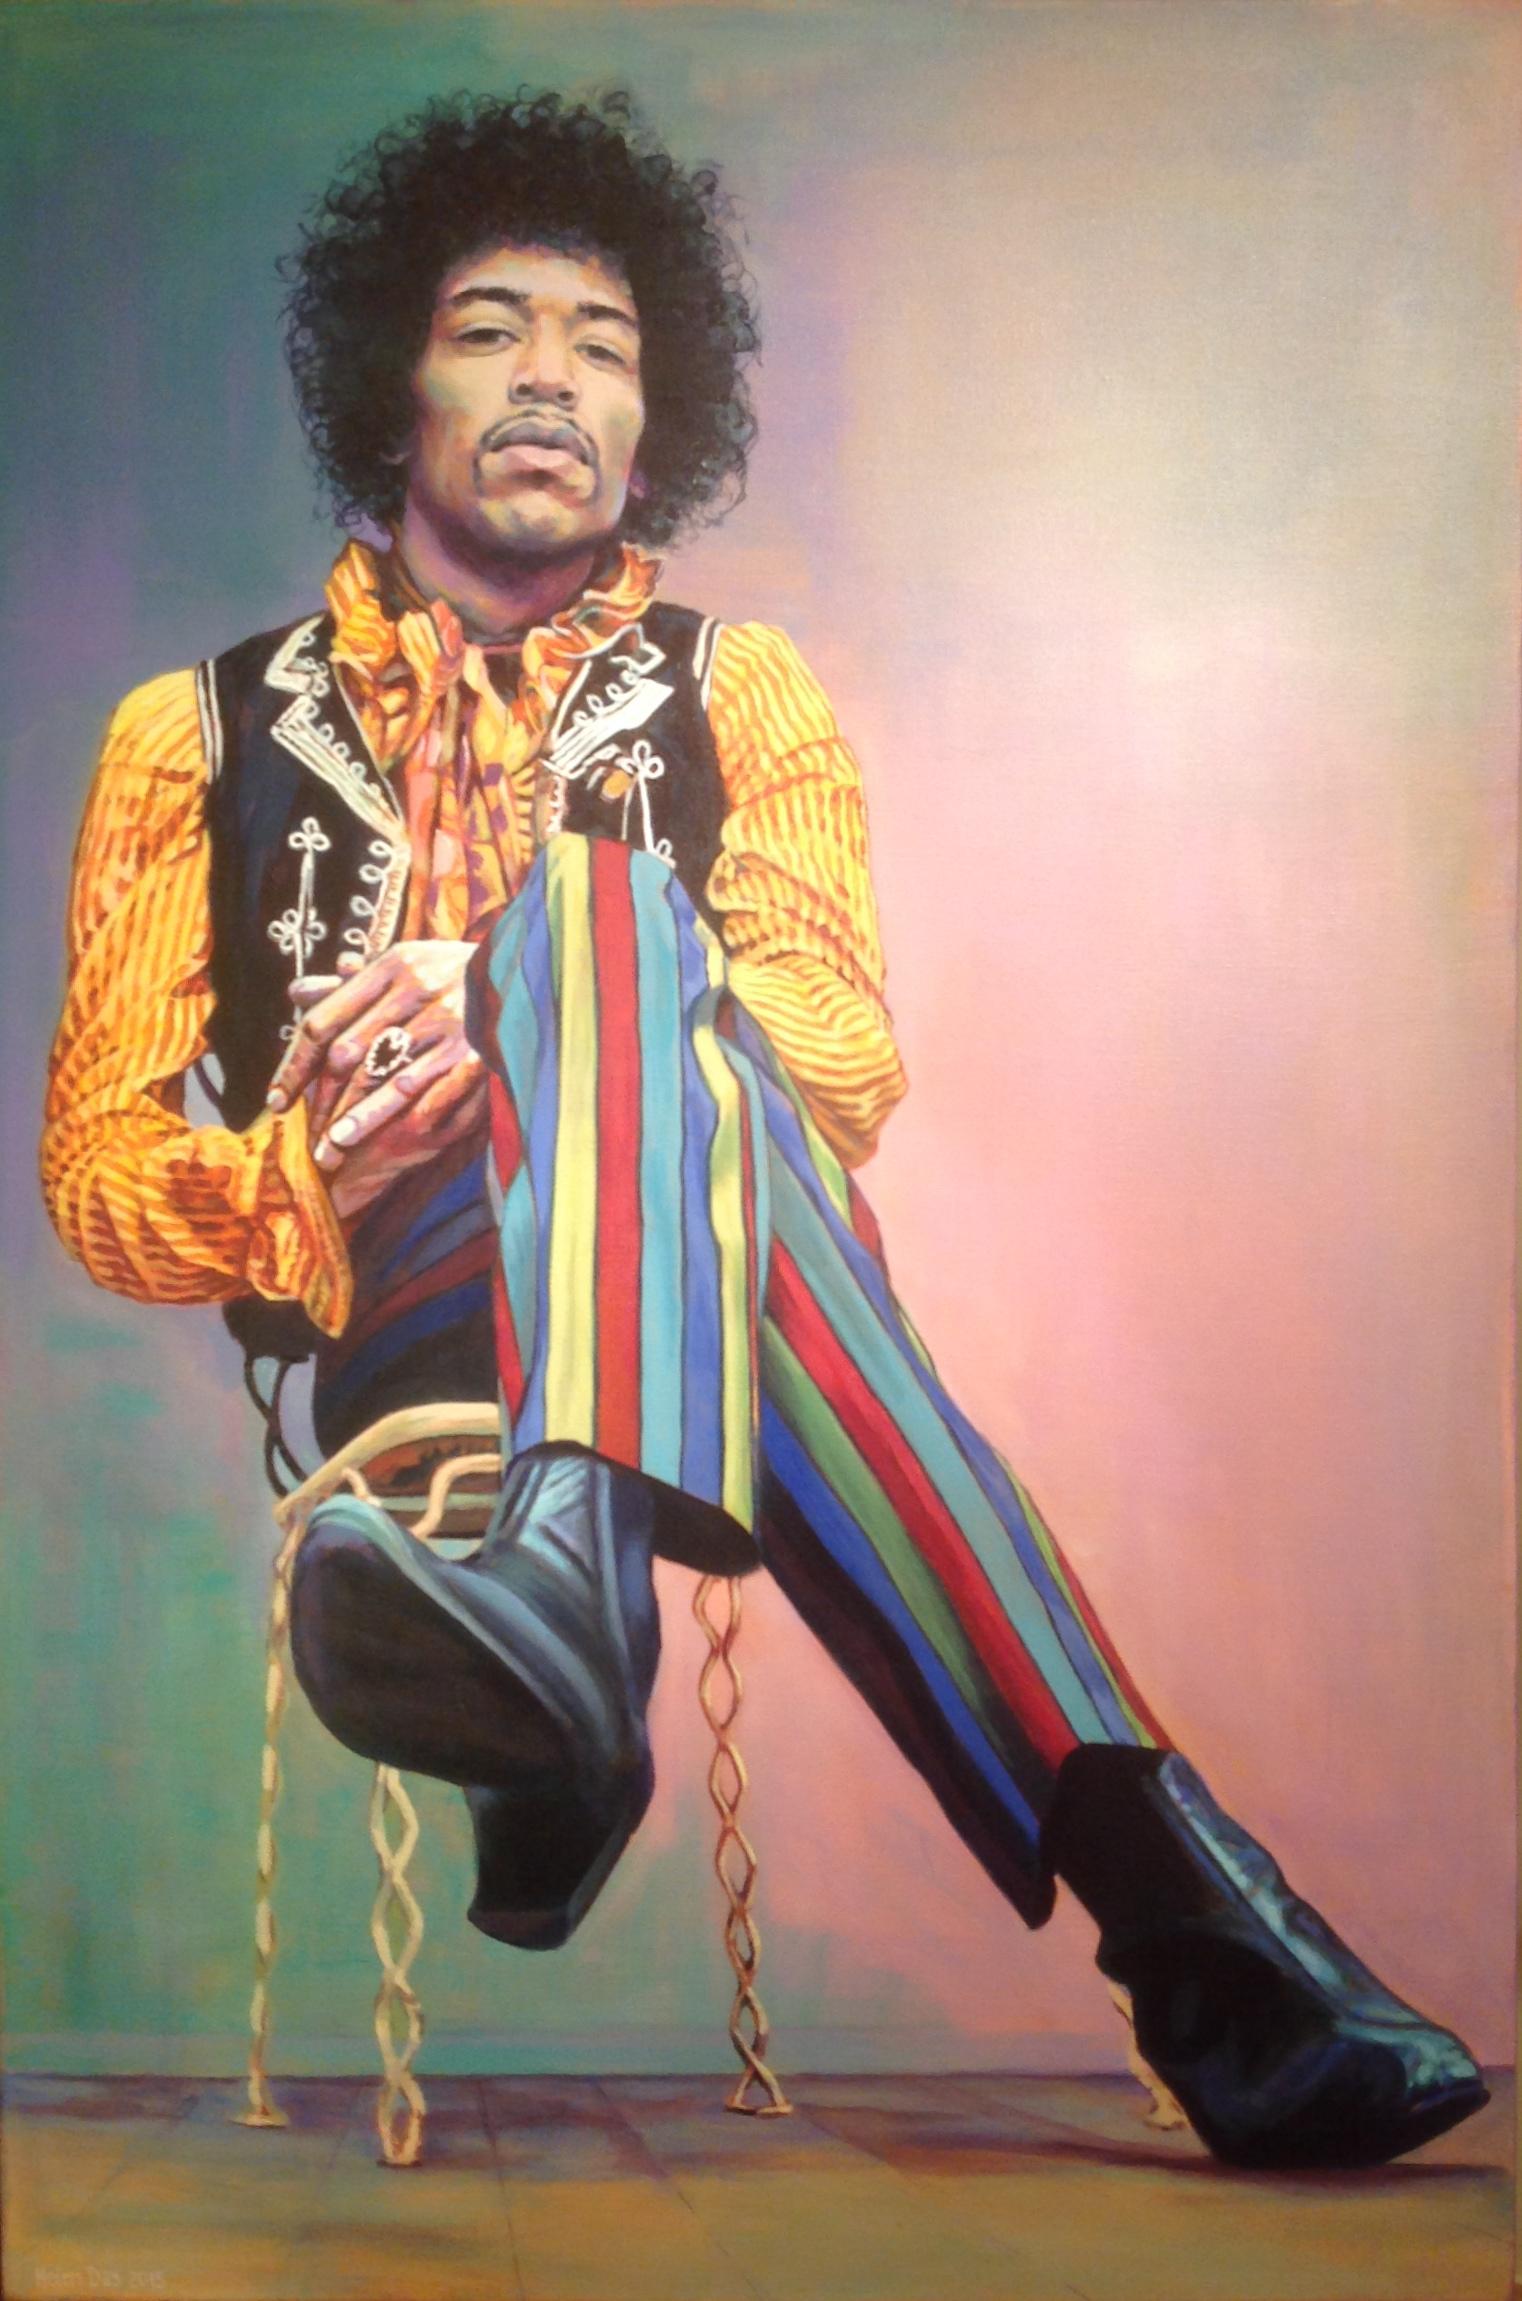 Jimi's stripey trousers